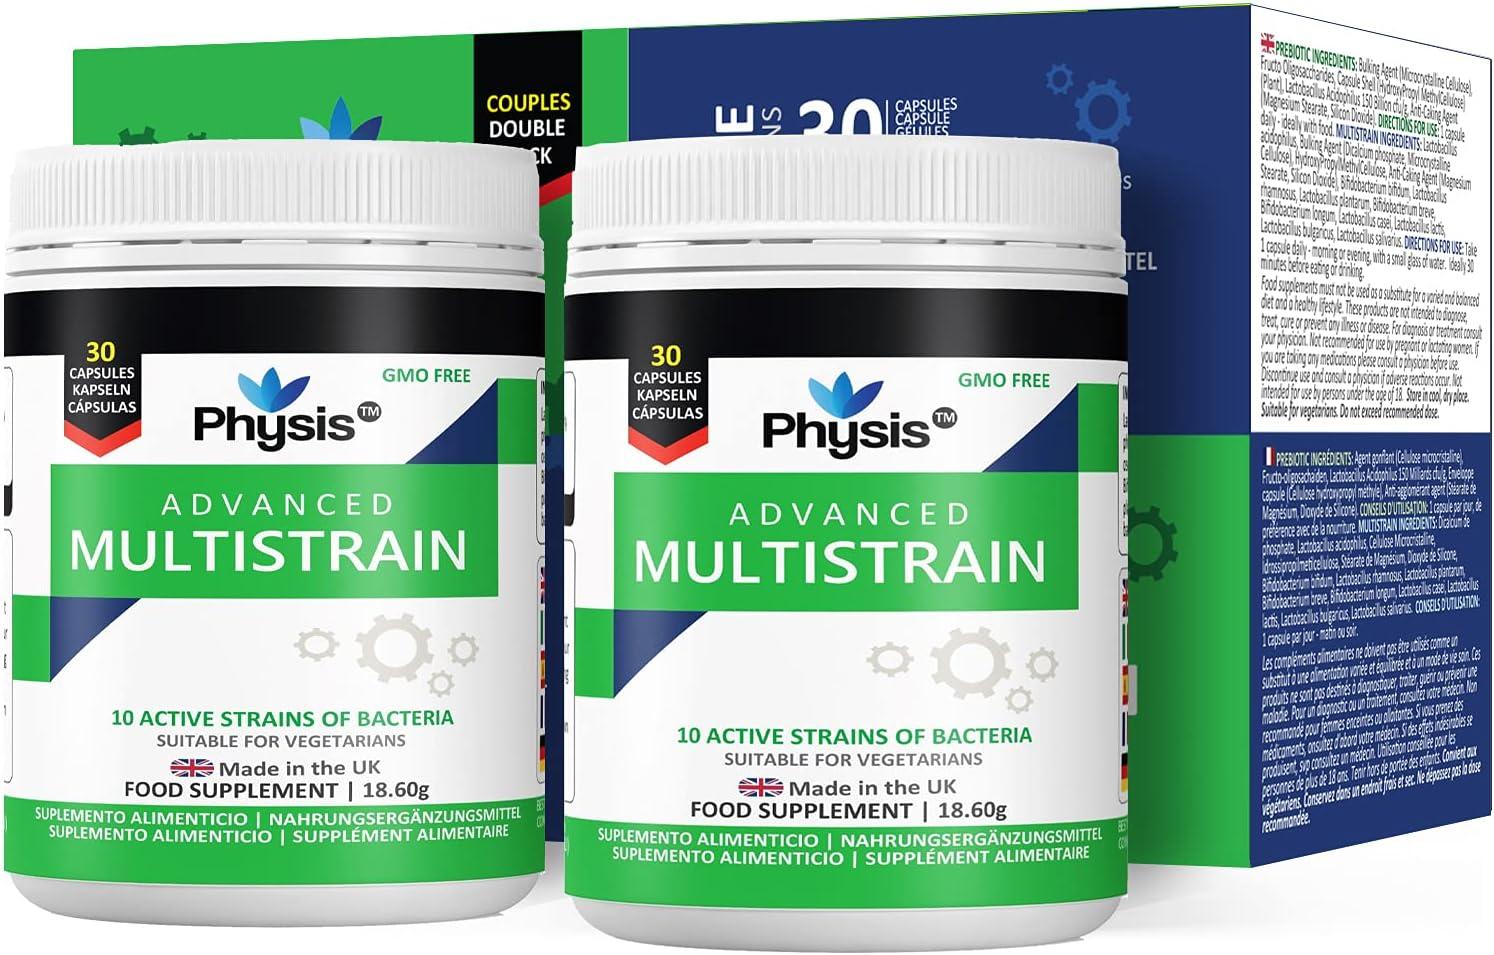 Physis Probiotics 200 billion CBE   20 bottles of 20 capsules each ...